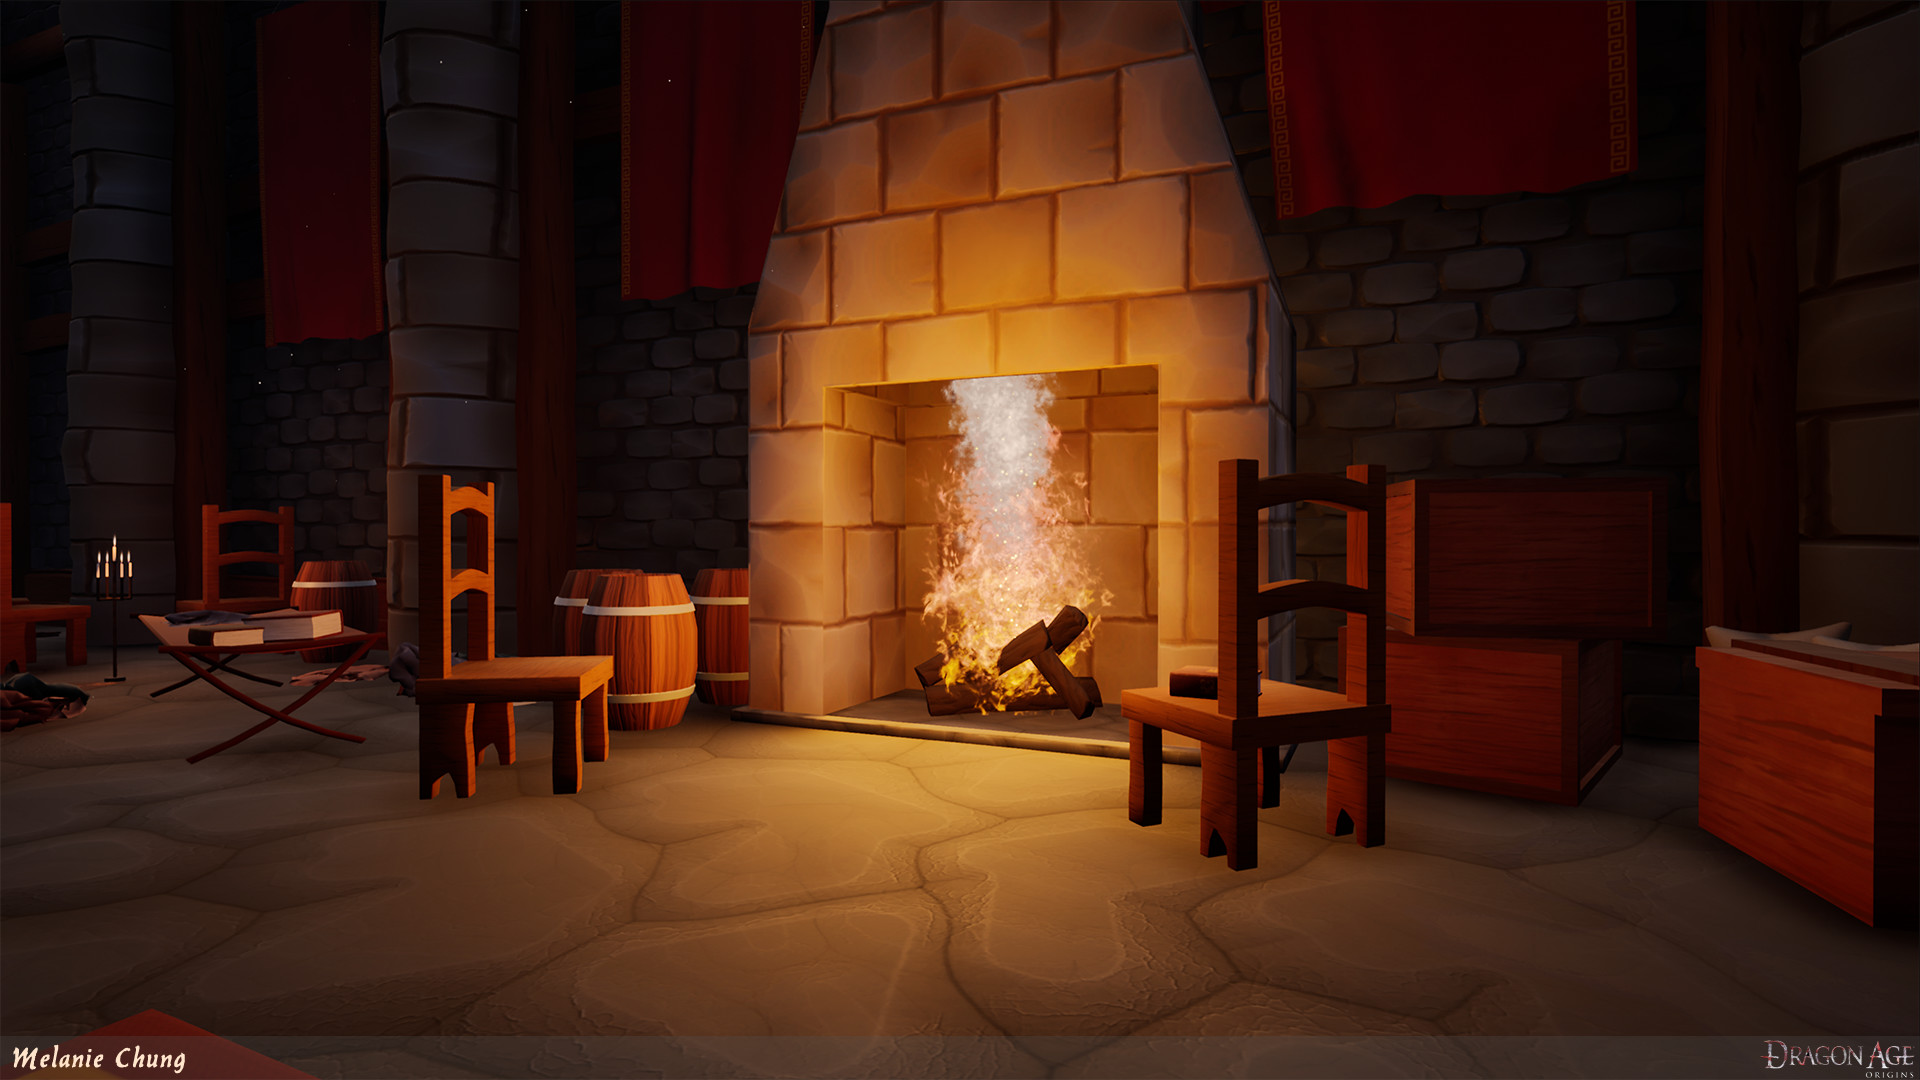 ArtStation - Dragon Age:Origins Redcliffe Chantry Stylized Remake